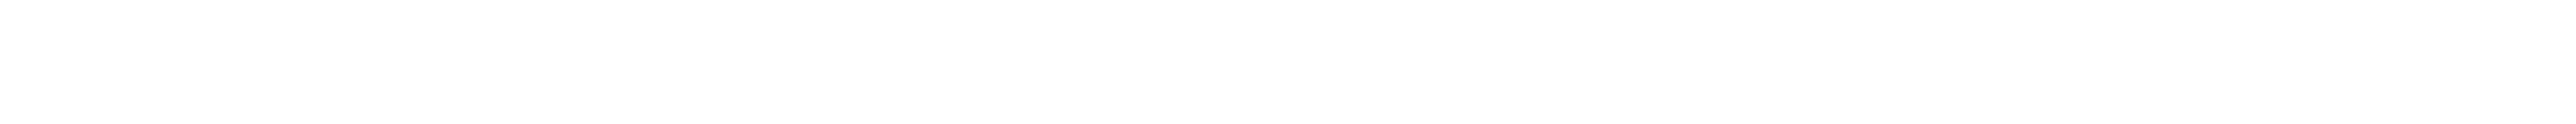 Pre and Post VGSE webinars